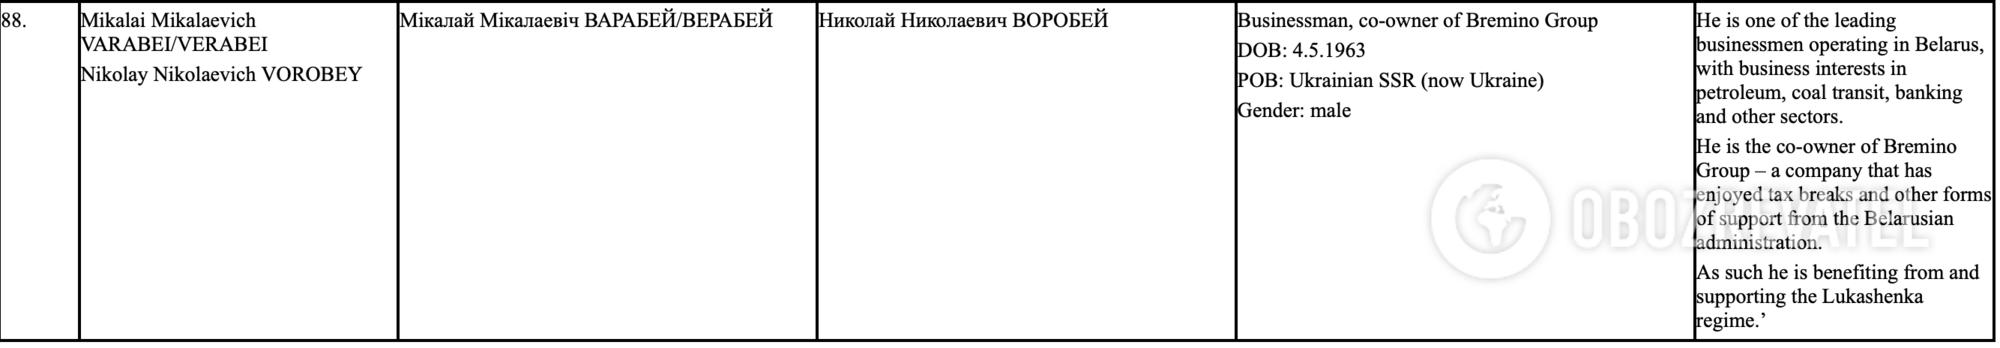 Николай Воробей попал под санкции ЕС